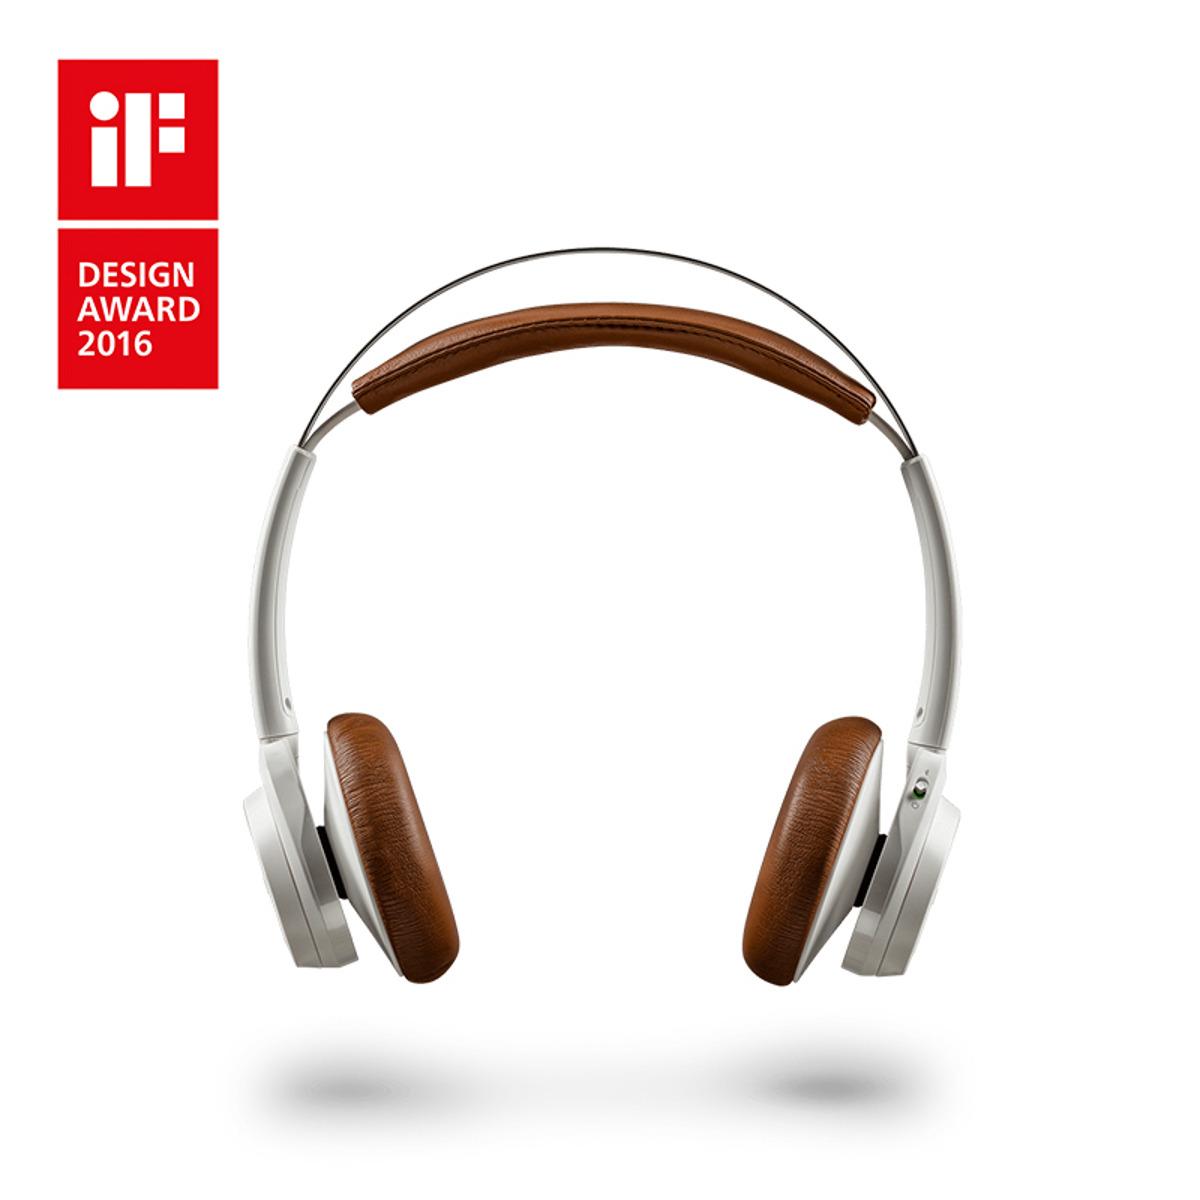 Plantronics gewinnt iF Design Award 2016